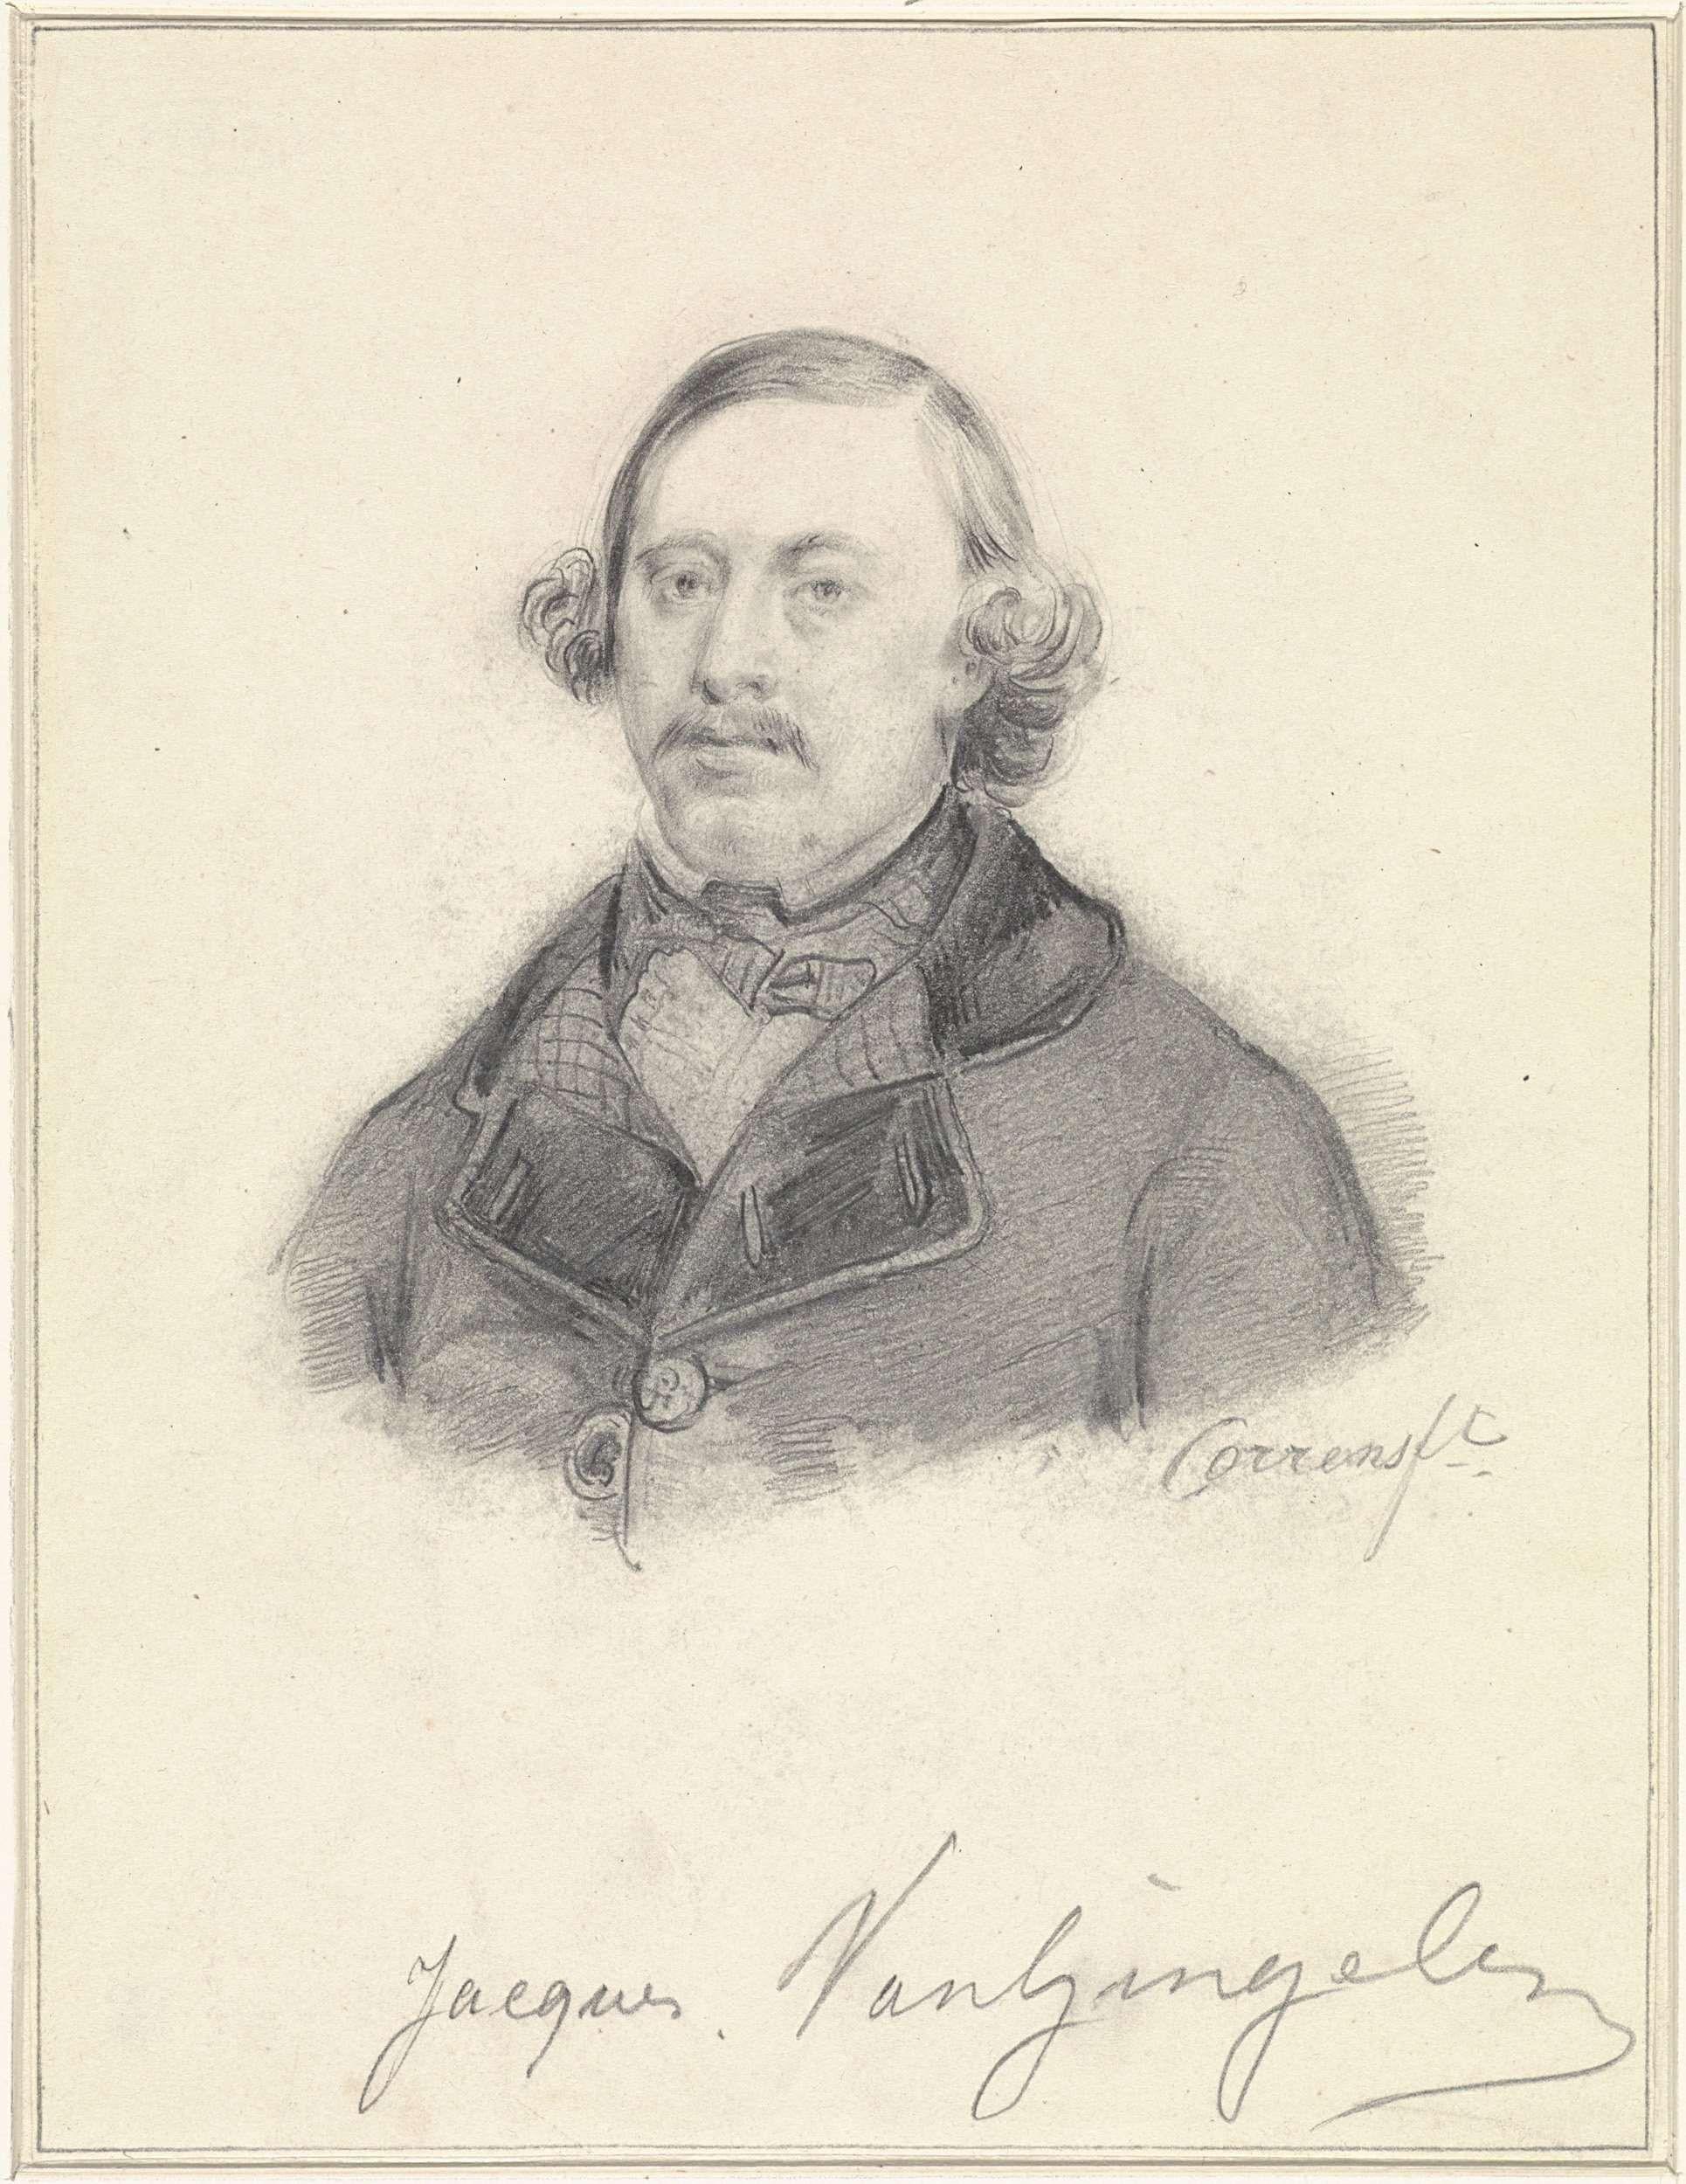 Jozef Cornelius Correns | Portret van Jacques van Gingelen, Jozef Cornelius Correns, 1840 - 1842 | Ontwerp voor een prent.